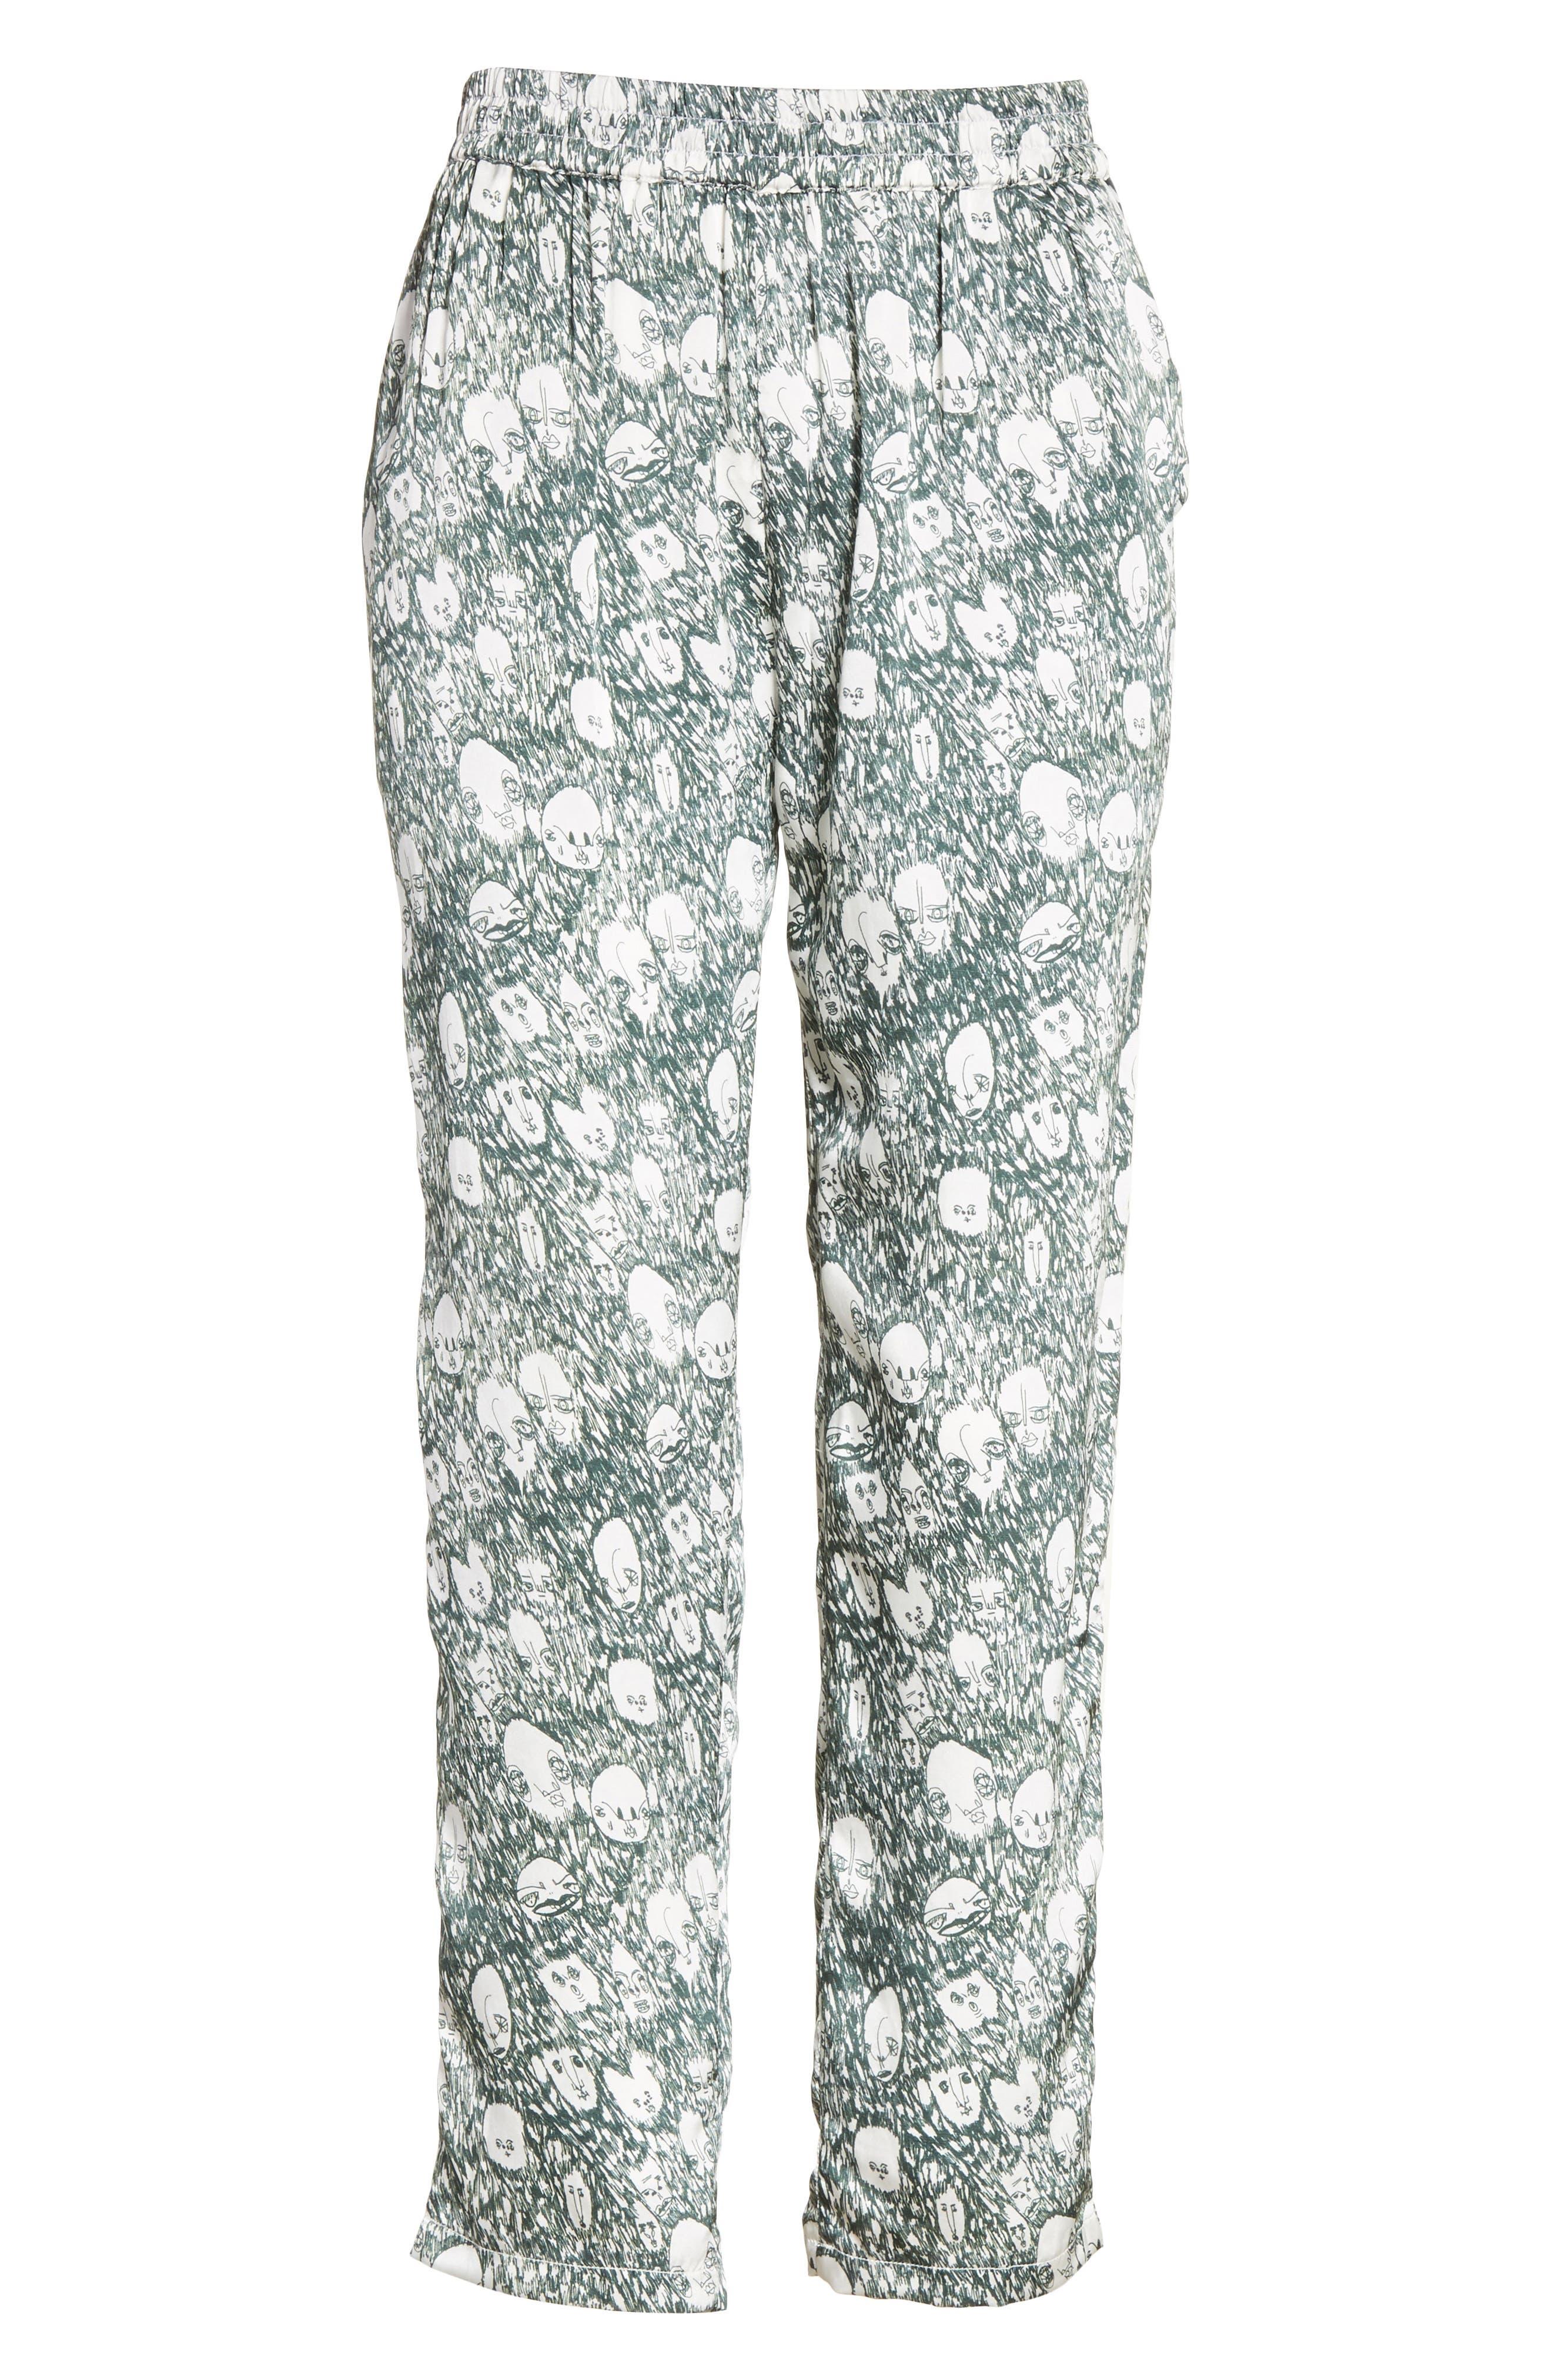 Angus Crop Silk Lounge Pants,                             Alternate thumbnail 6, color,                             900